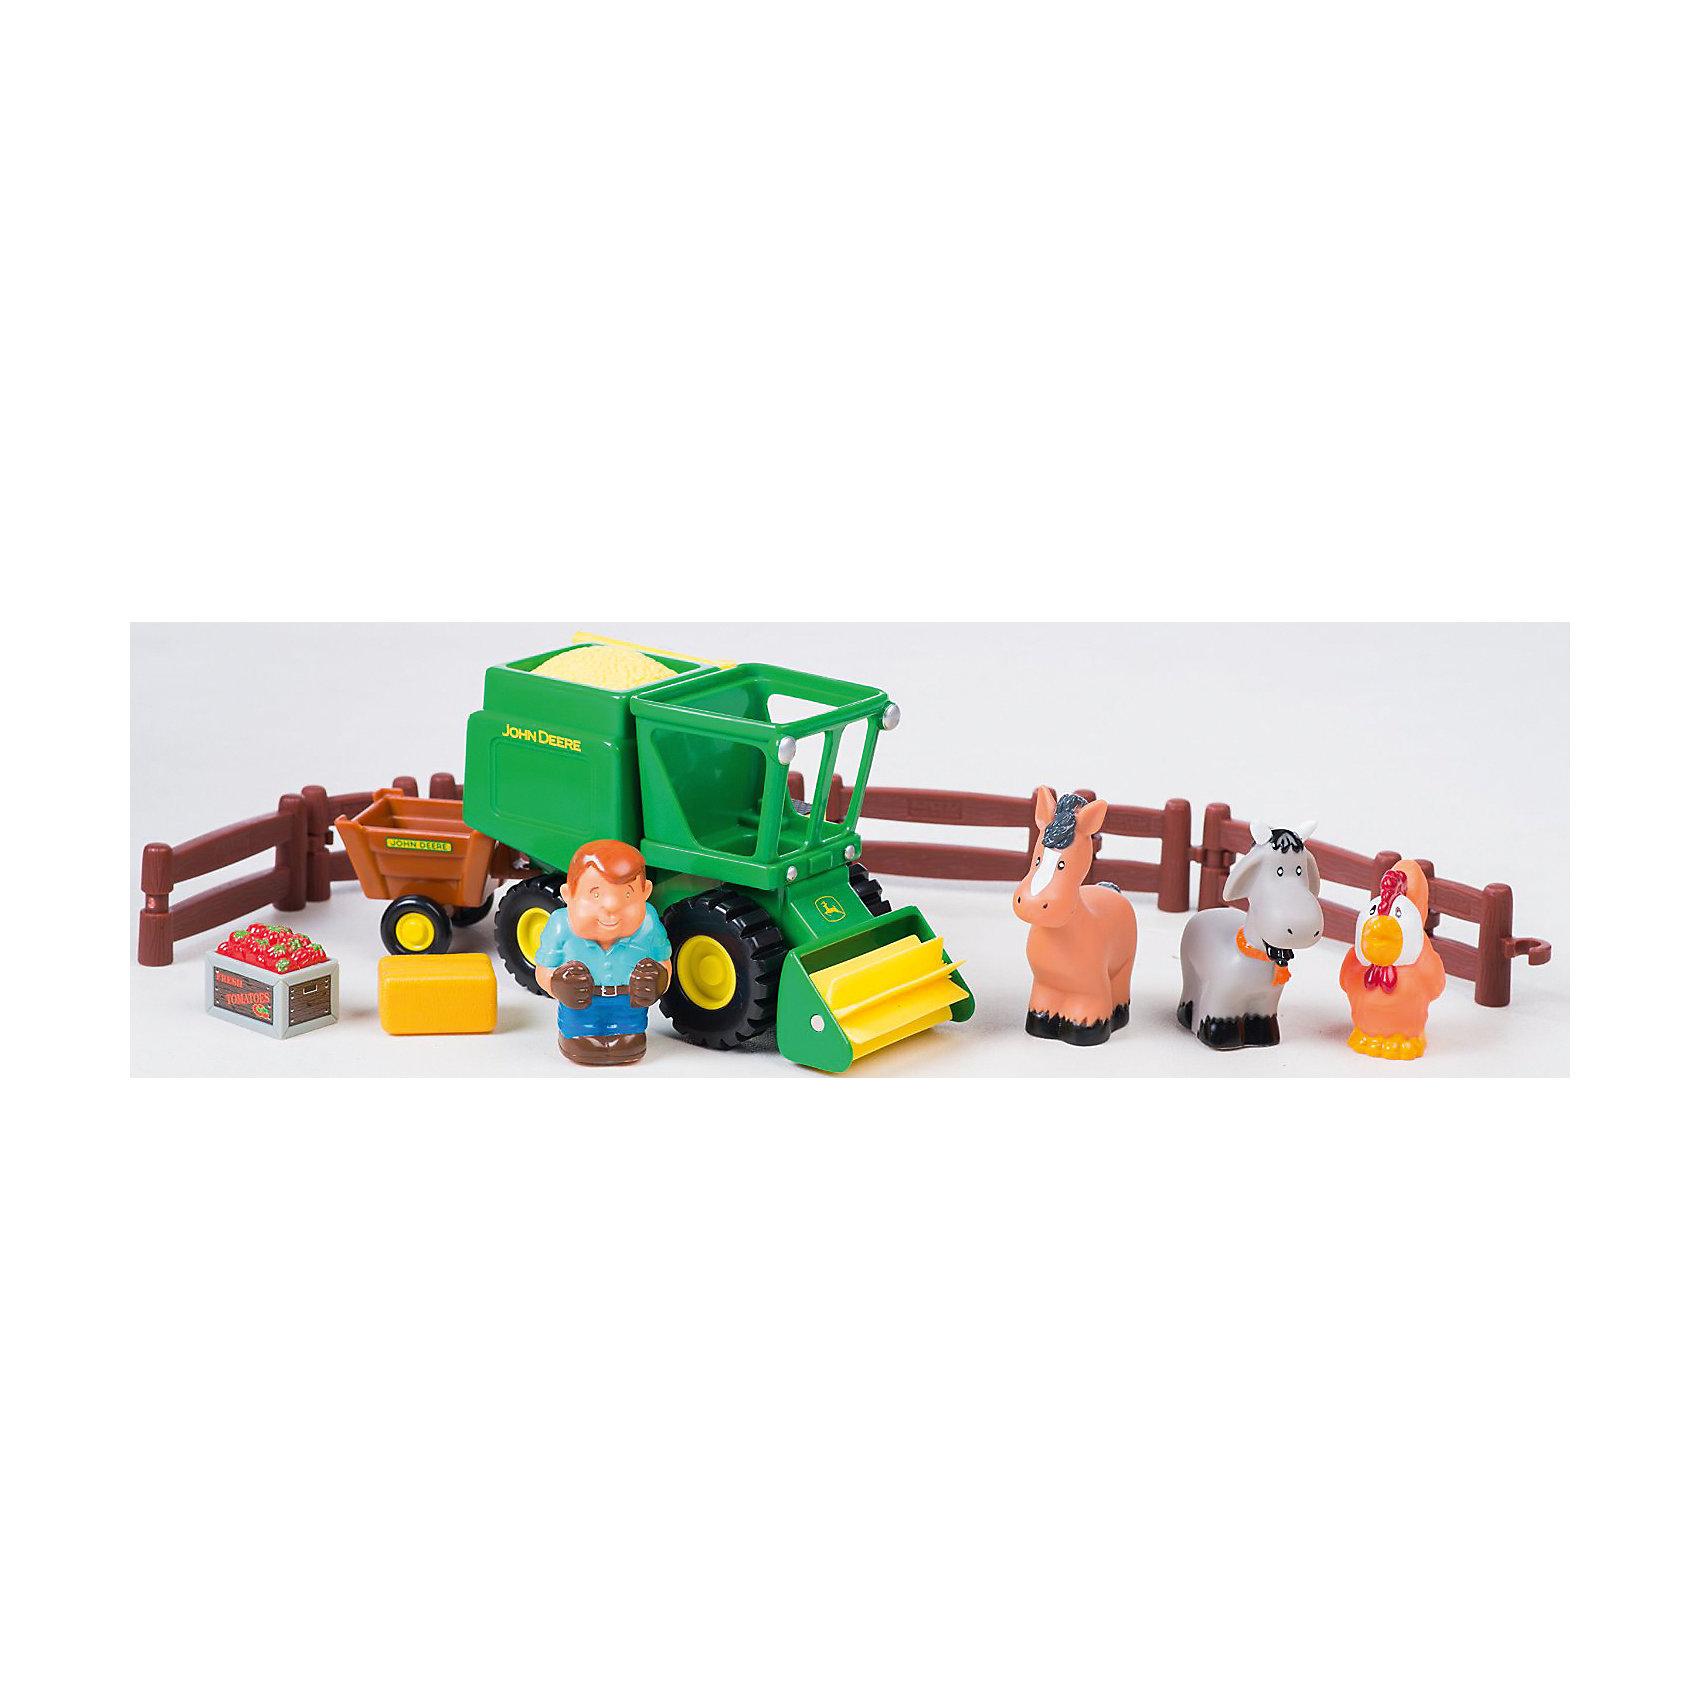 TOMY Игровой набор Уборка урожая, John Deere, Tomy tomy трактор john deere 6830